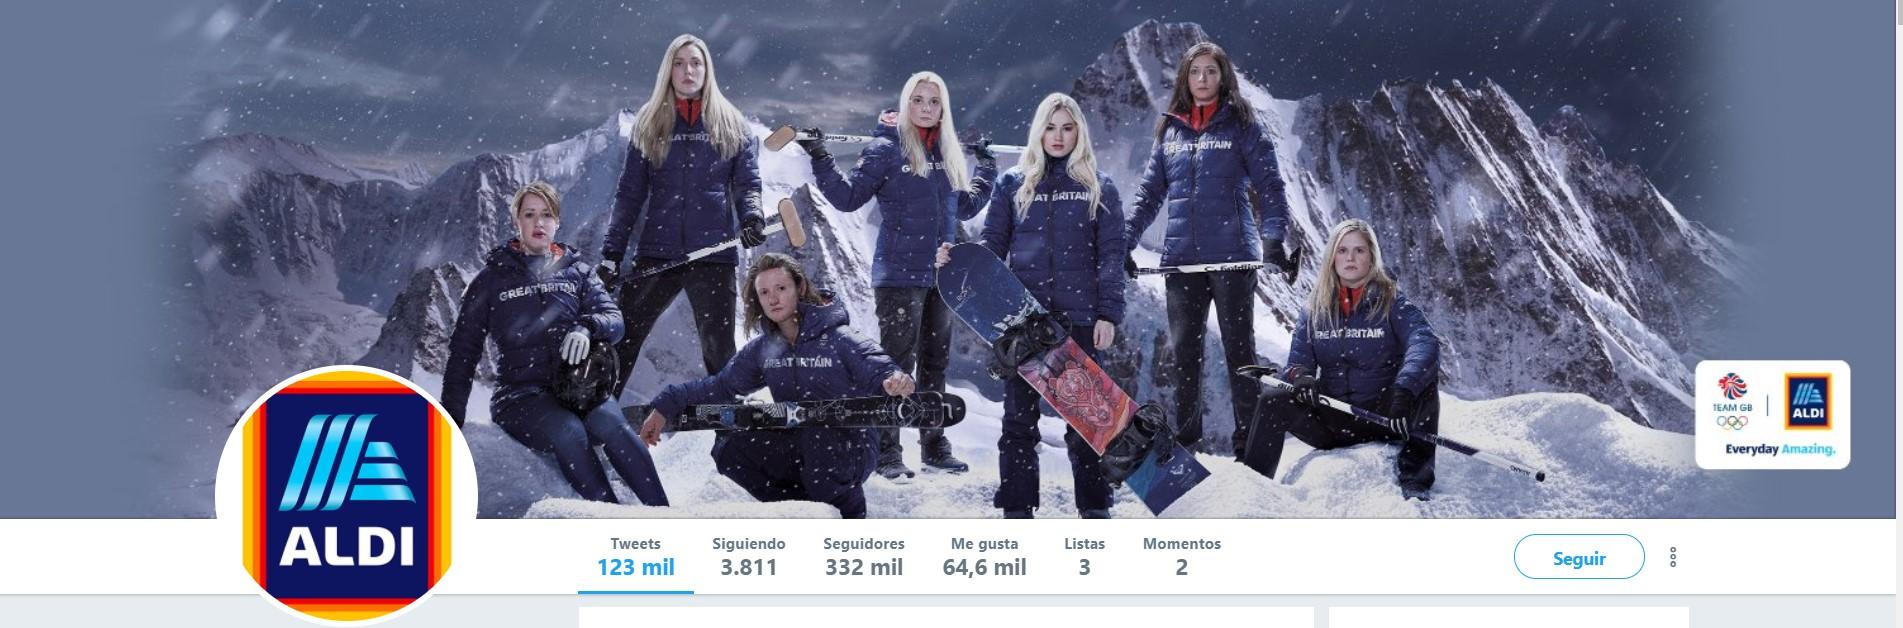 Aldi Team GB Winter Olympics.jpg